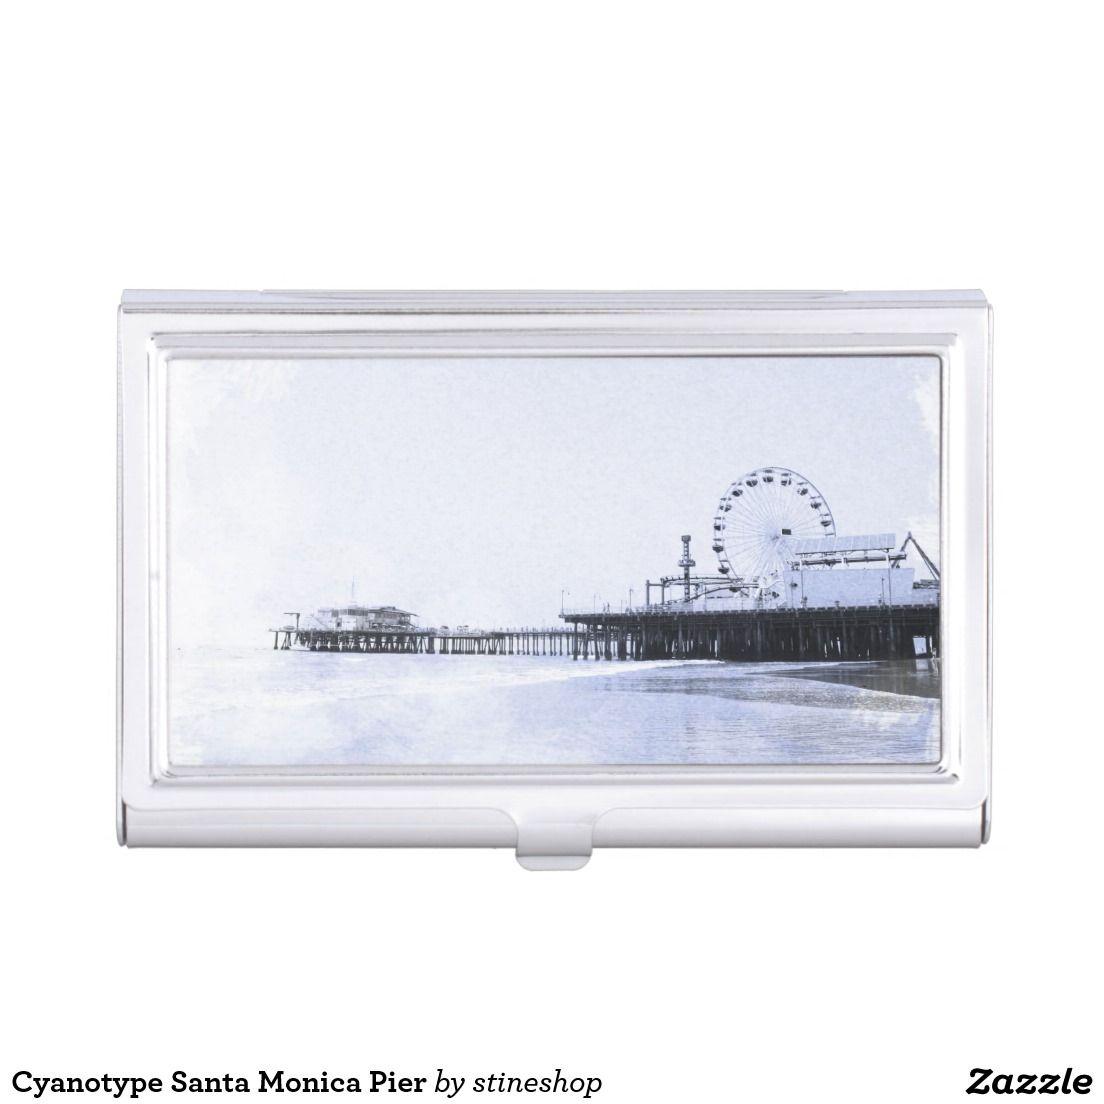 Cyanotype santa monica pier business card holder zizzling zazzle cyanotype santa monica pier business card holder colourmoves